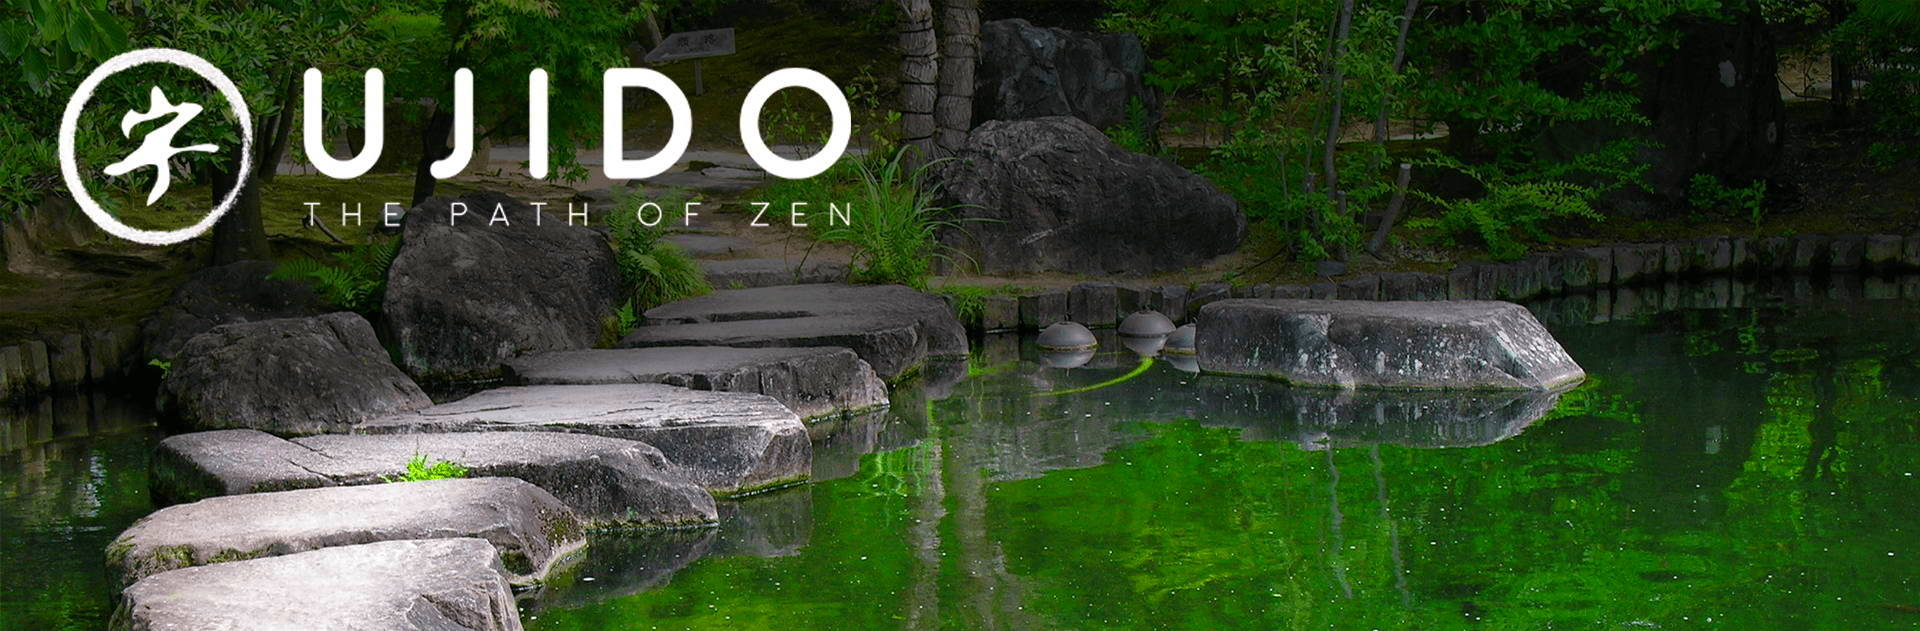 About Us Ujido Company Info Path of Zen